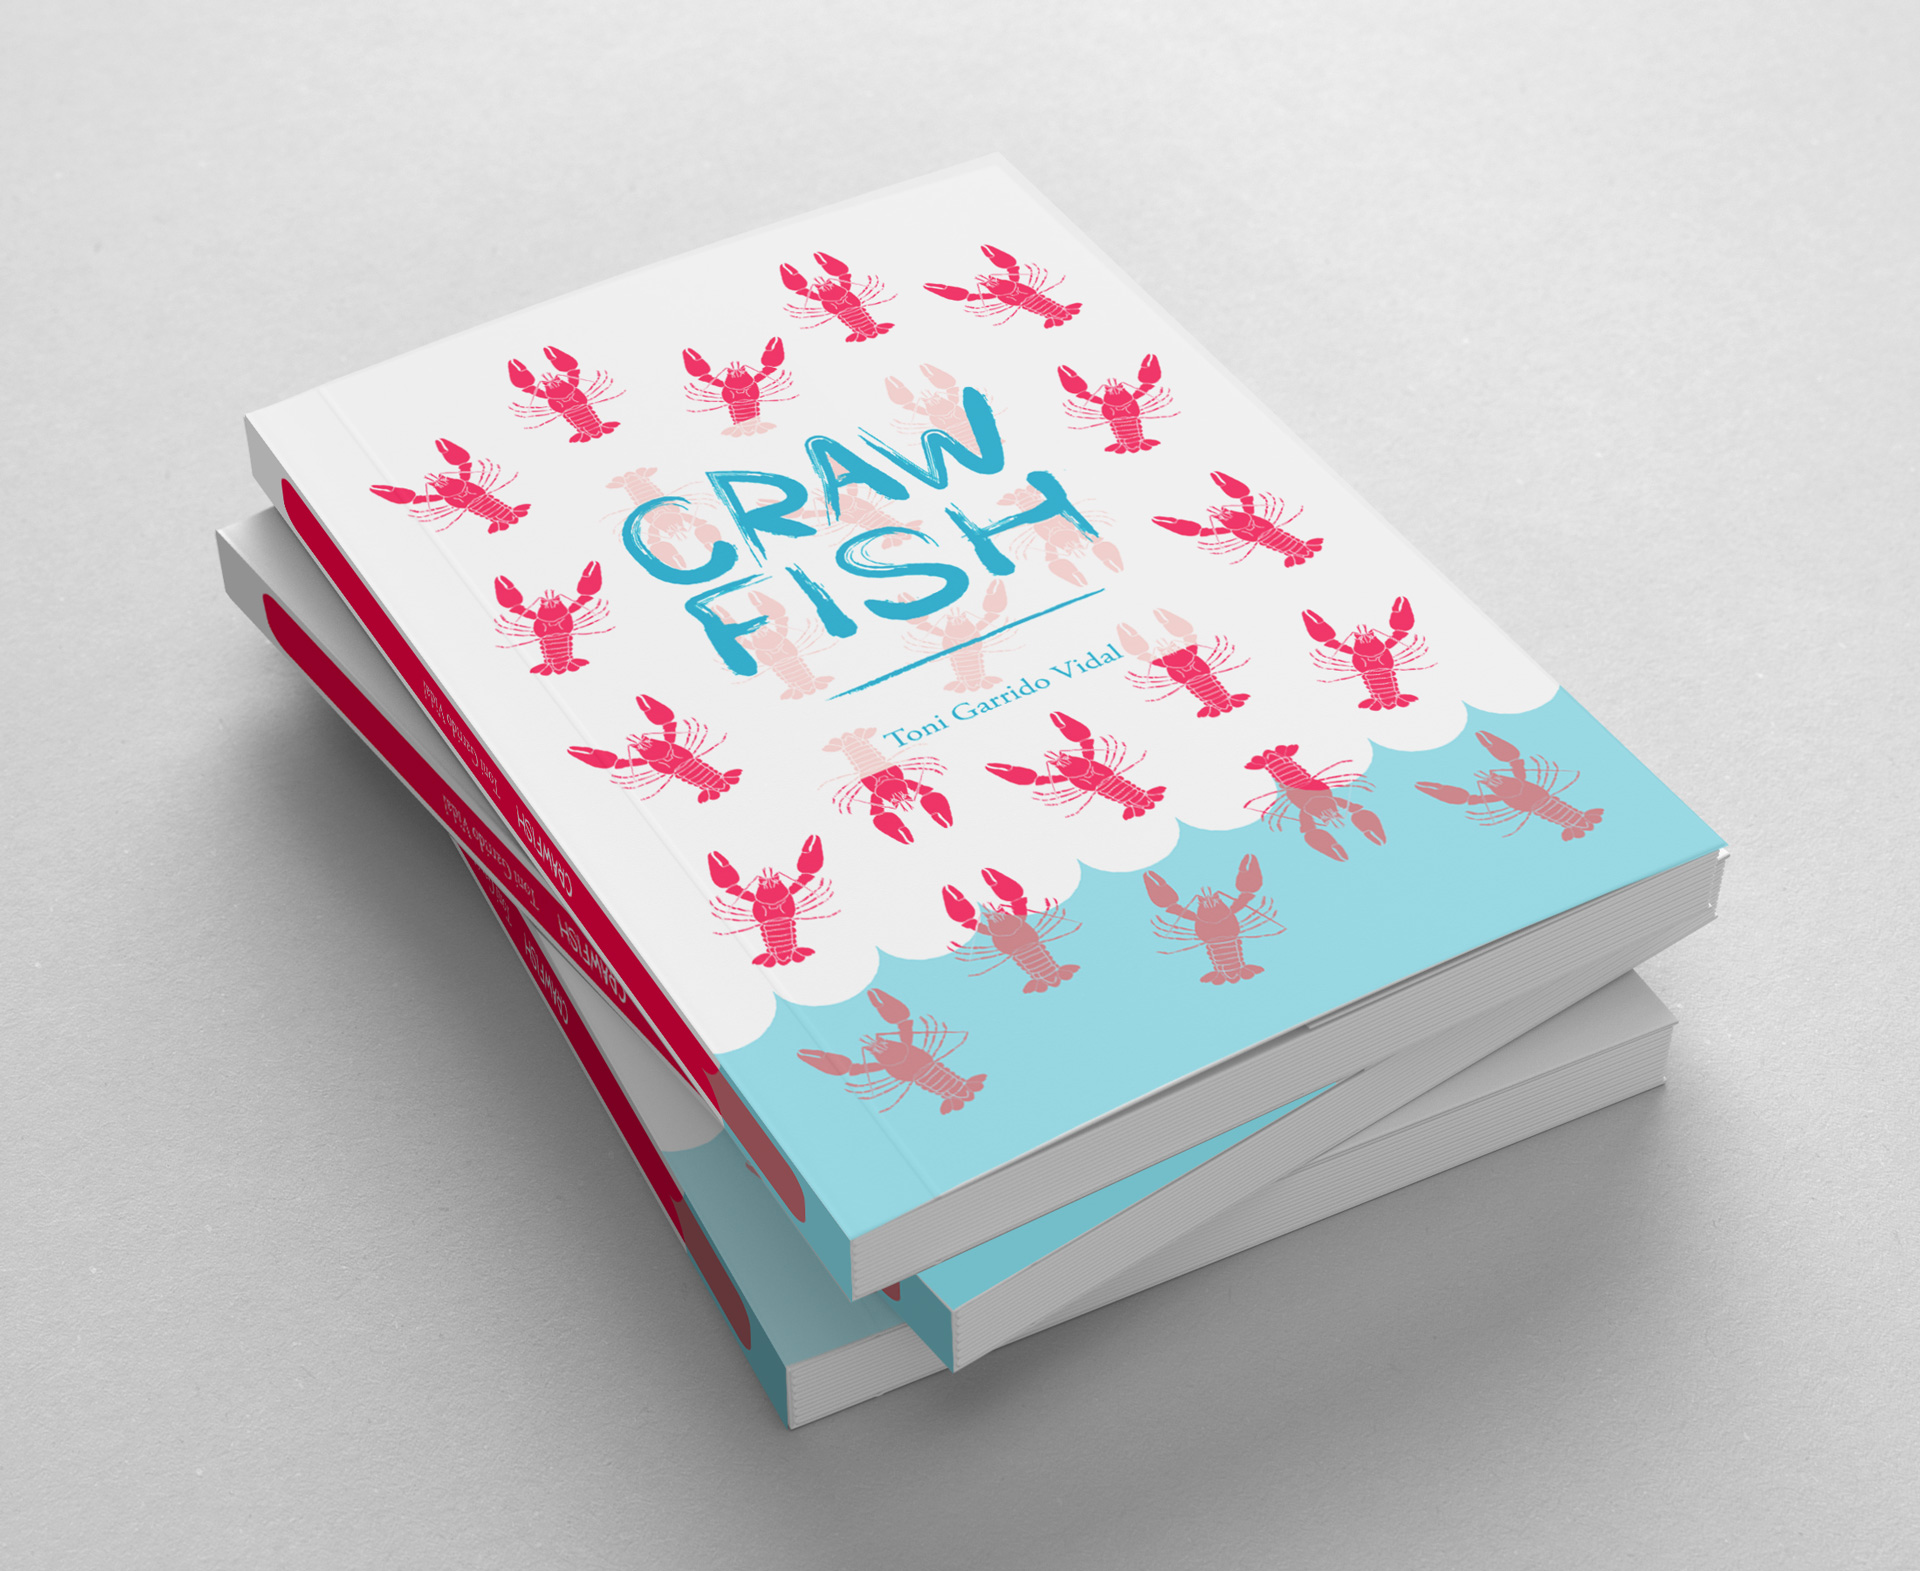 Crawfish_libro